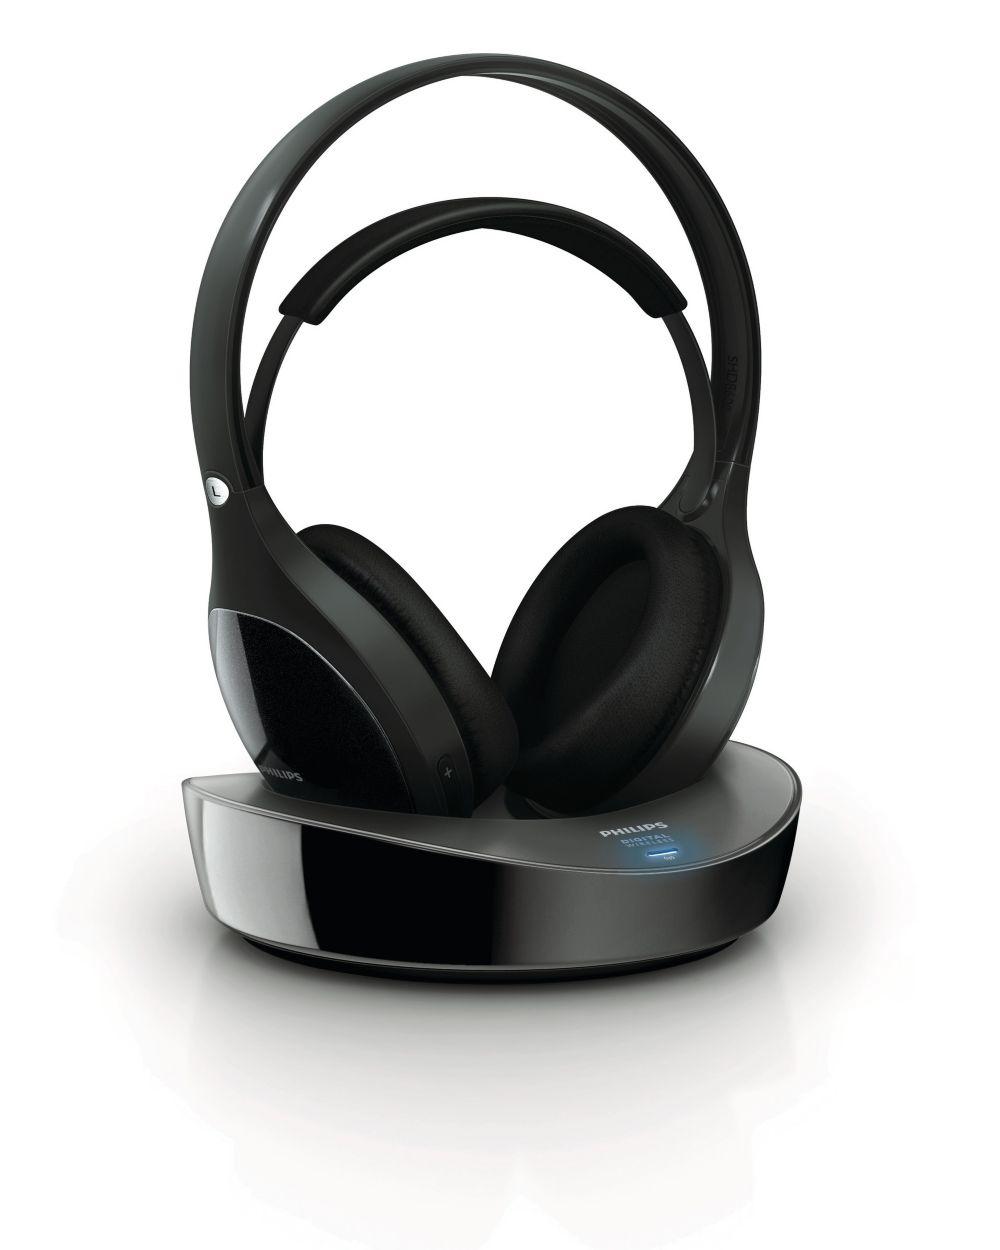 Philips Cuffie wireless digitali SHD8600/10